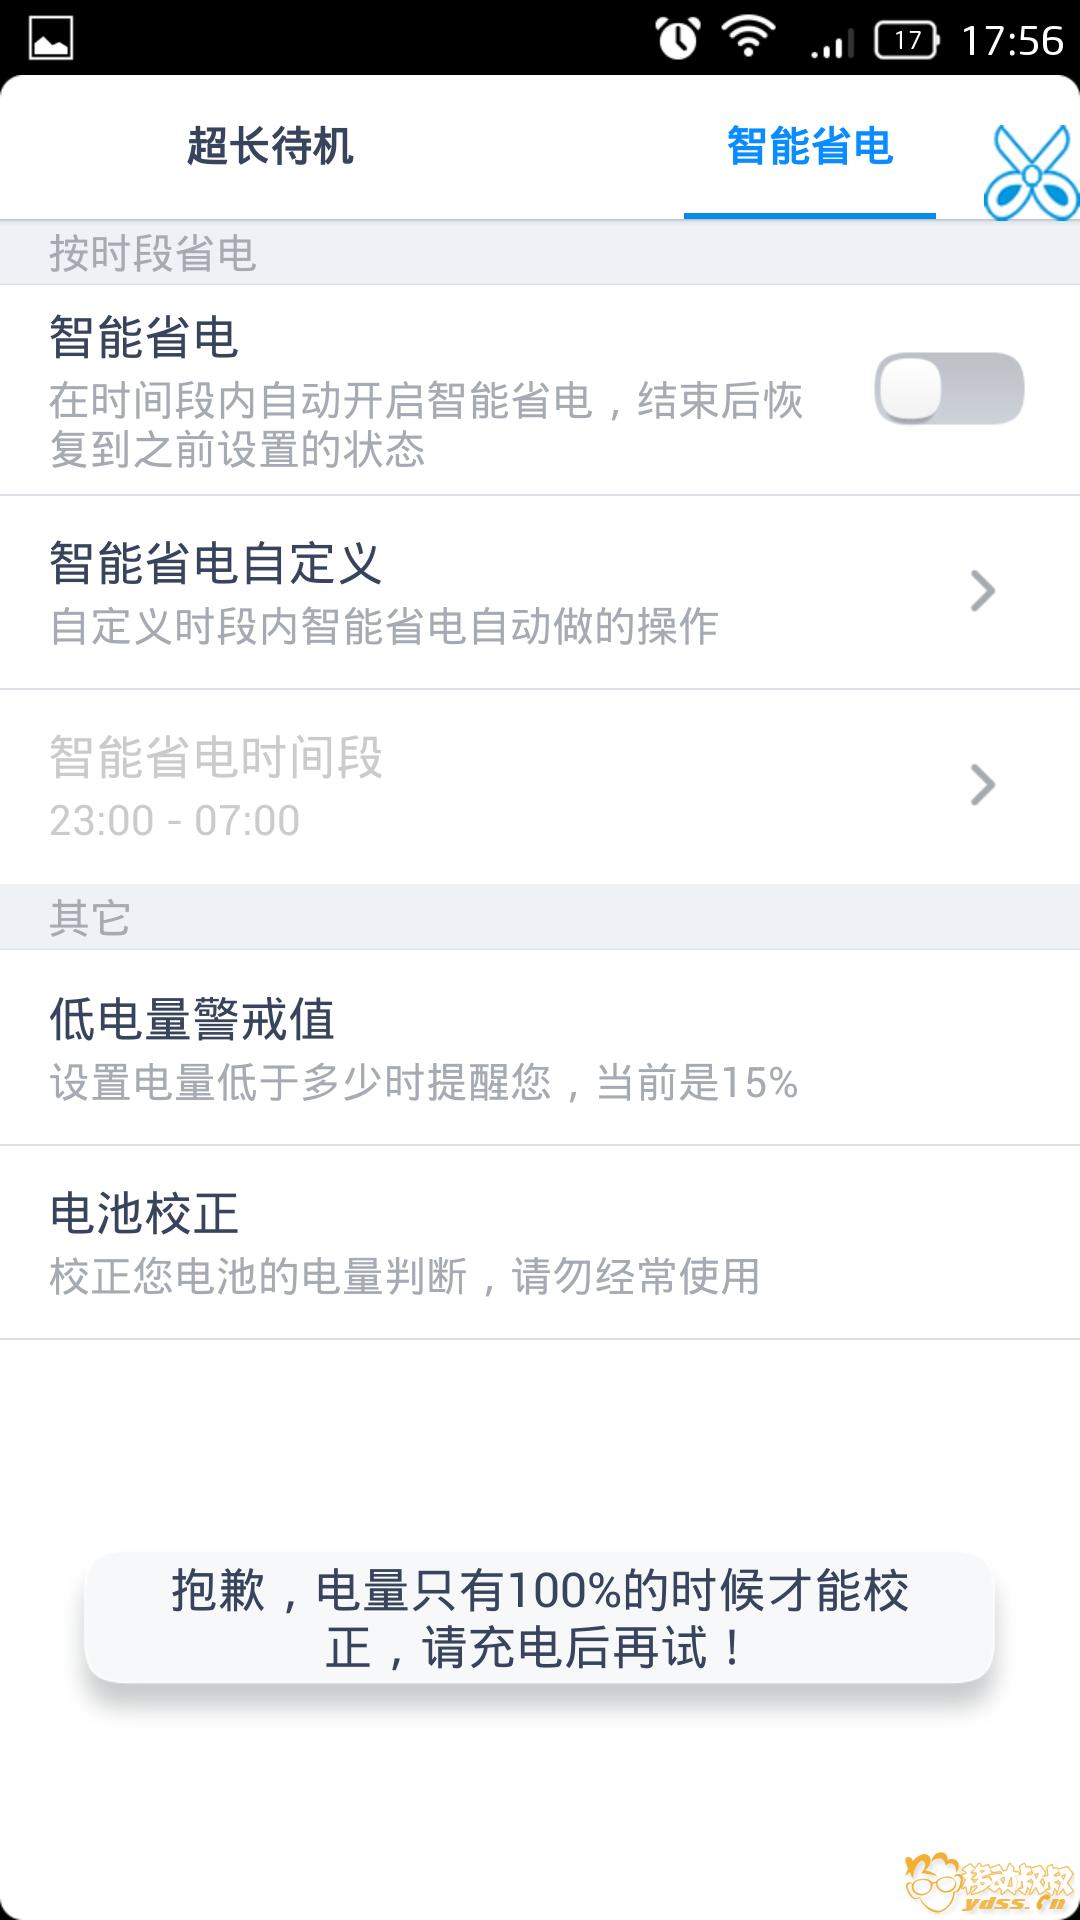 Screenshot_2014-06-18-17-56-57.png